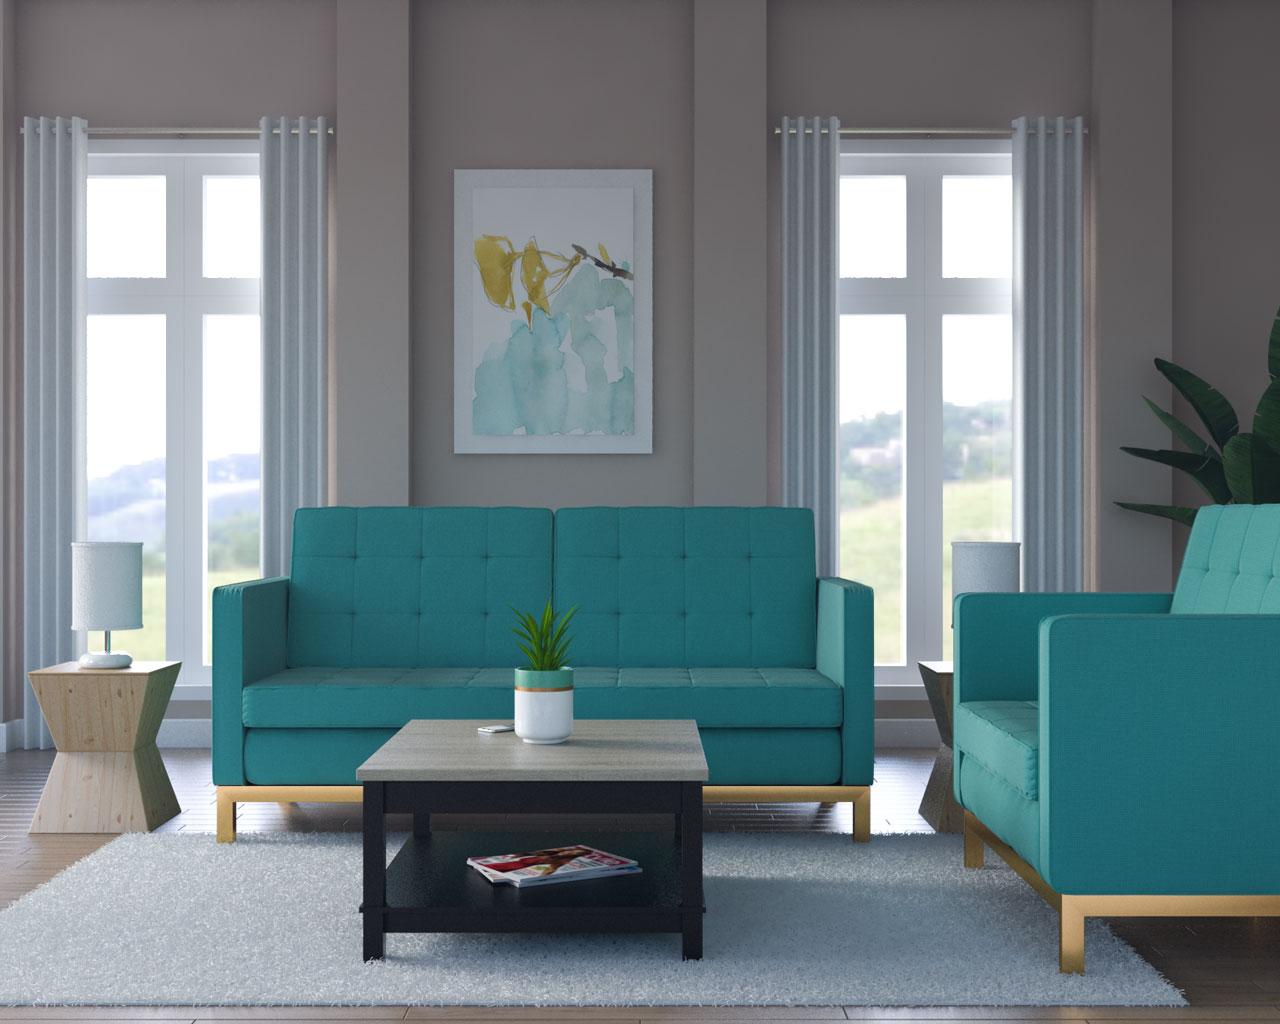 Tan walls with teal furniture